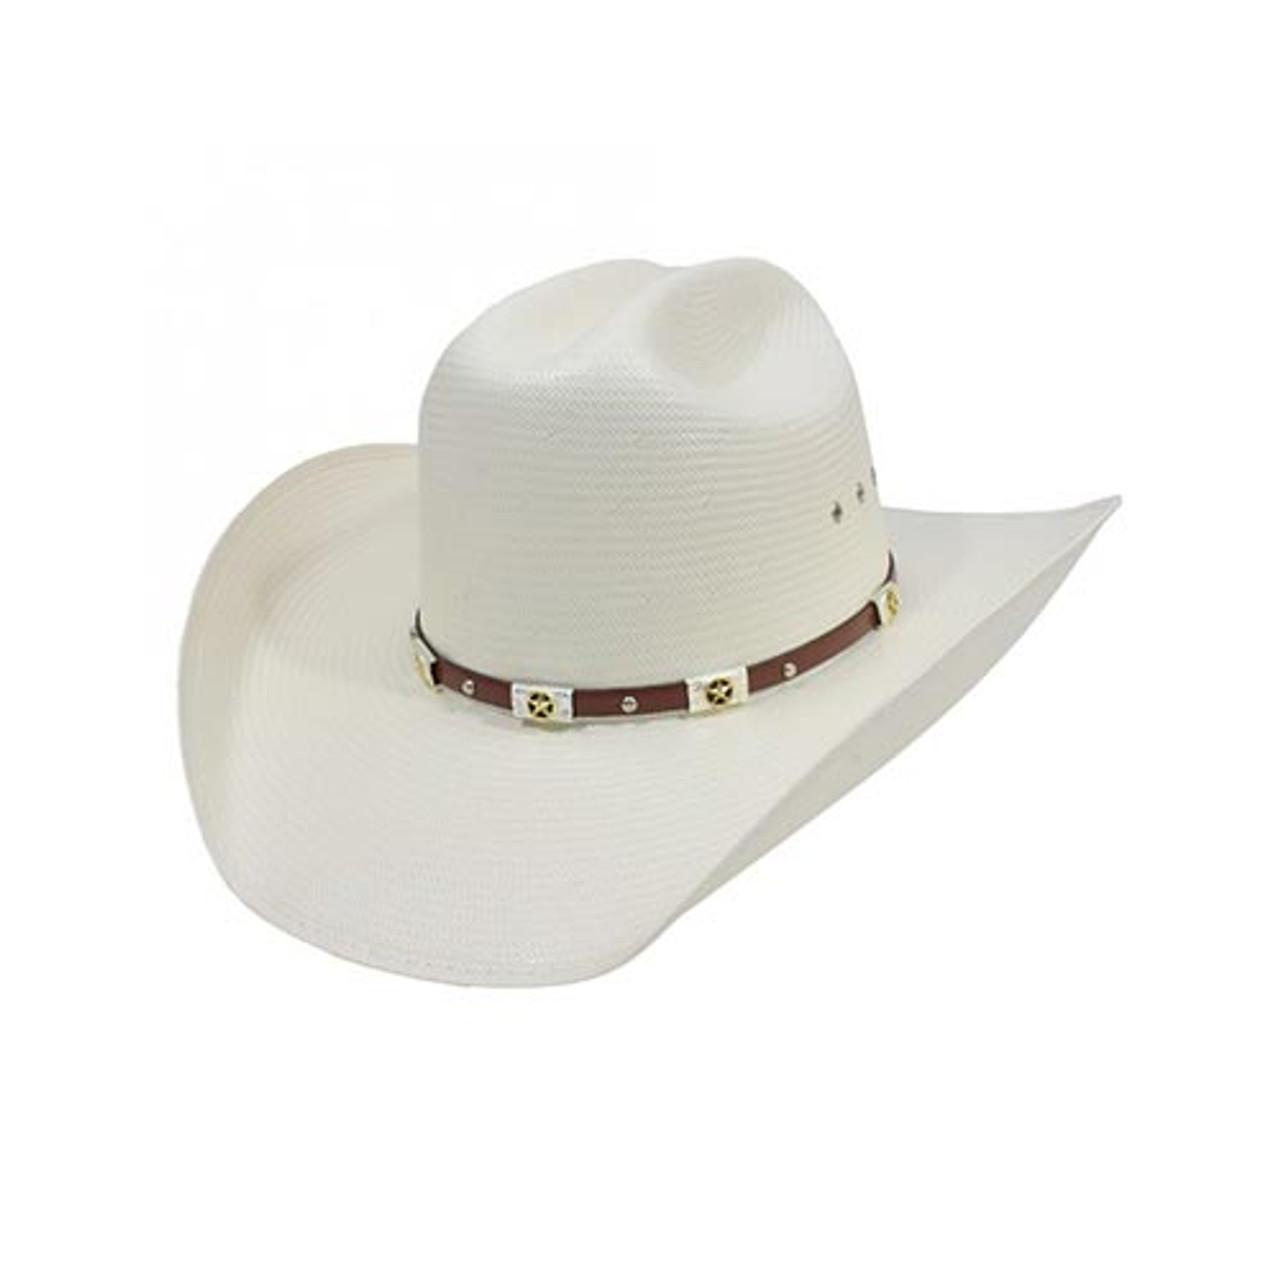 Larry Mahan Straw Hats - Alamo-N - 10X - Billy s Western Wear f88af610c26